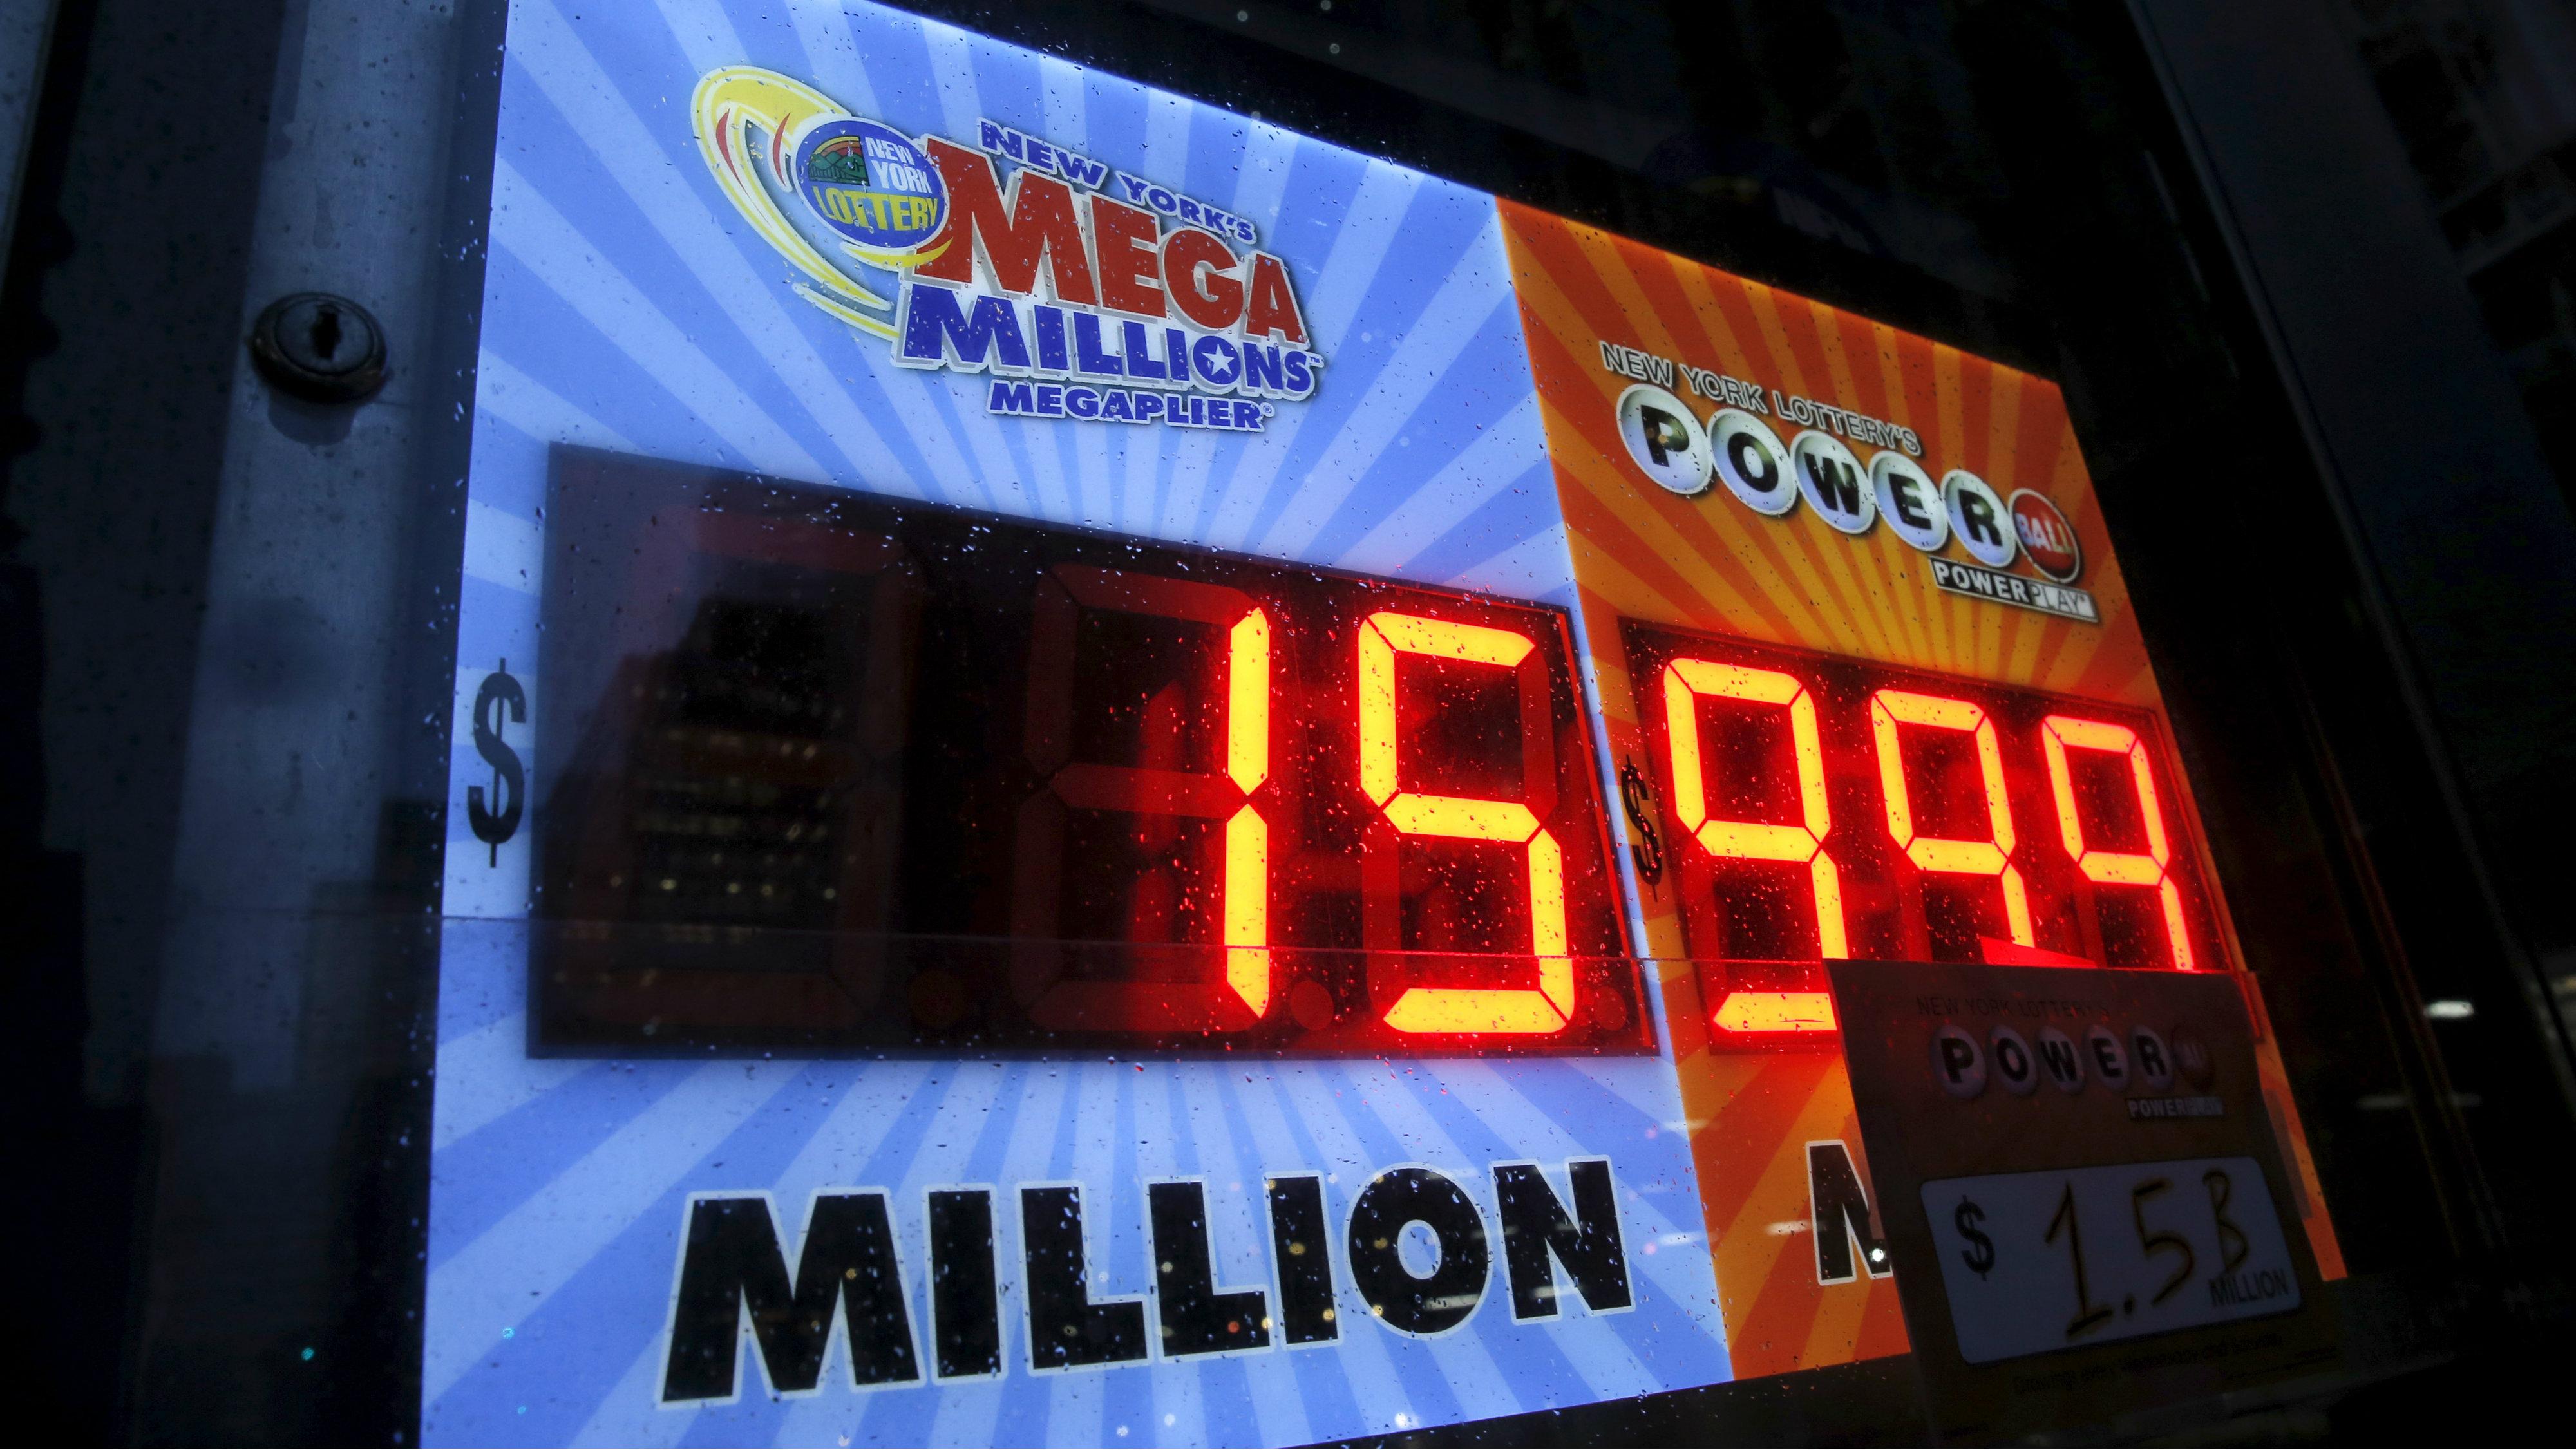 The Mega Millions lottery is based on a lie — Quartz